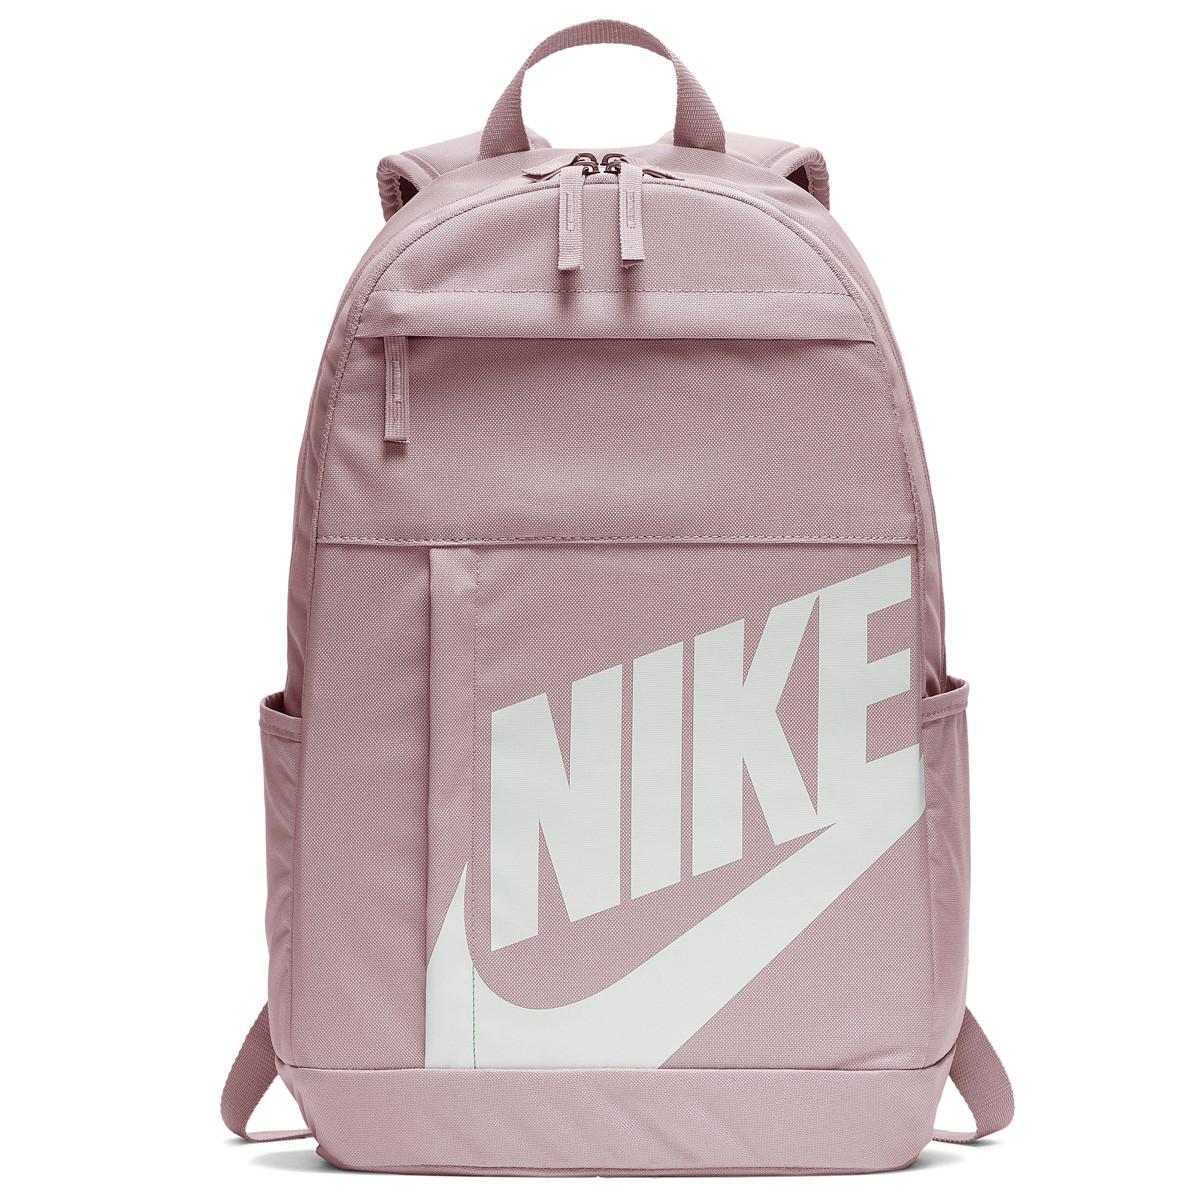 Silenciosamente Desafortunadamente Coordinar  Mochila rosa con múltiples bolsillos Nike   Querol online